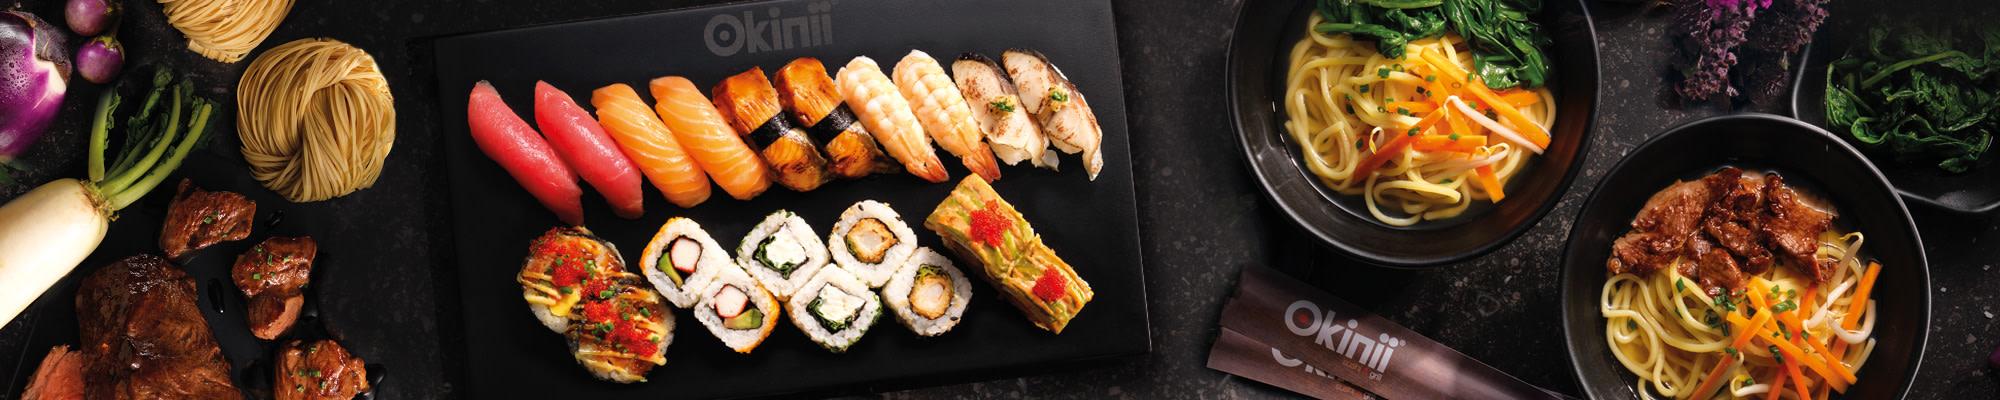 Okinii Sushi & Grill Warengruppenbild